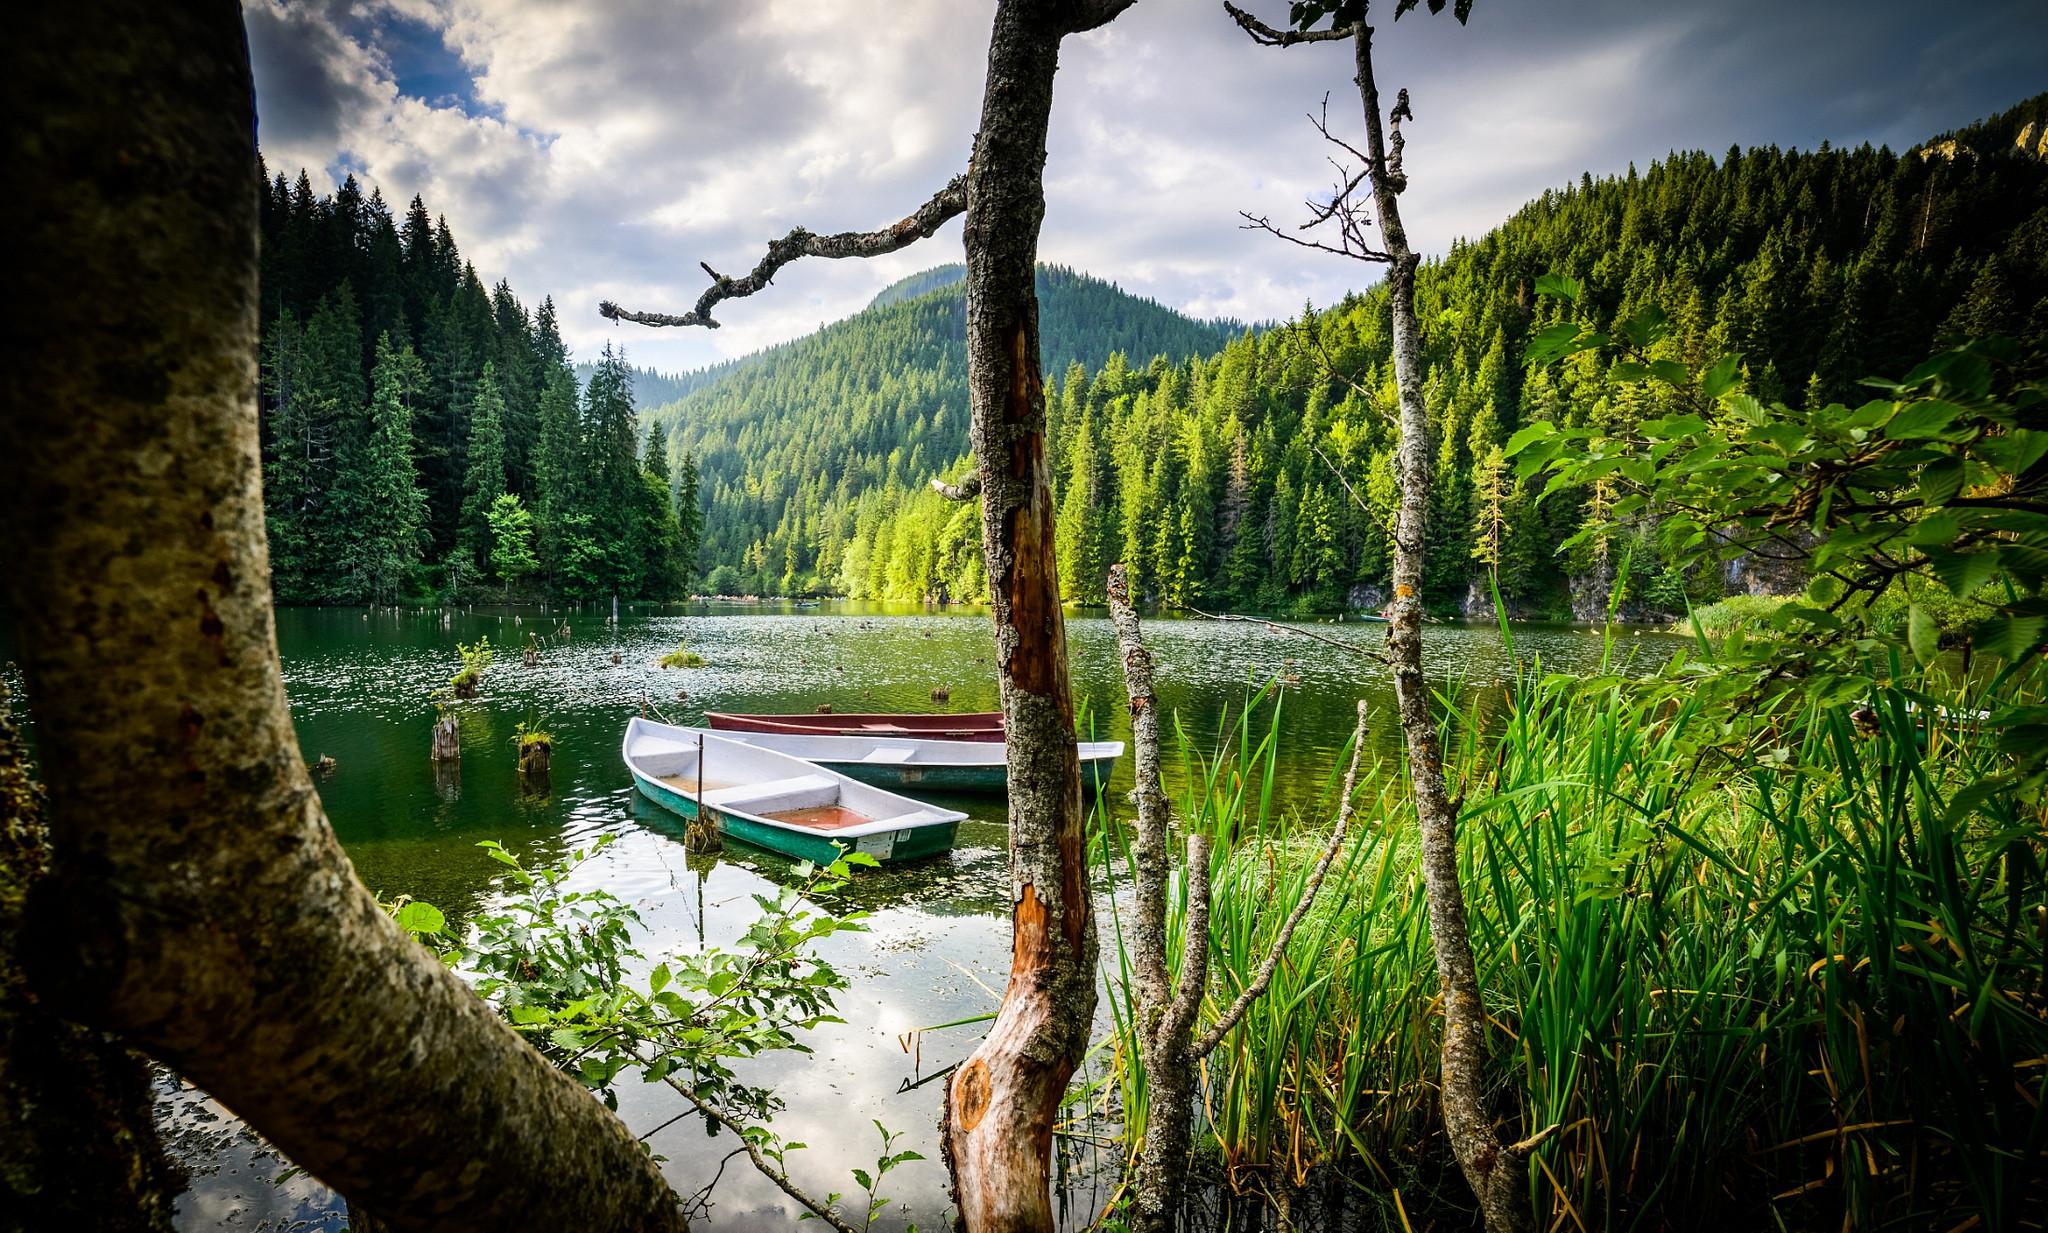 обои водоём, озеро, лодки, деревья картинки фото